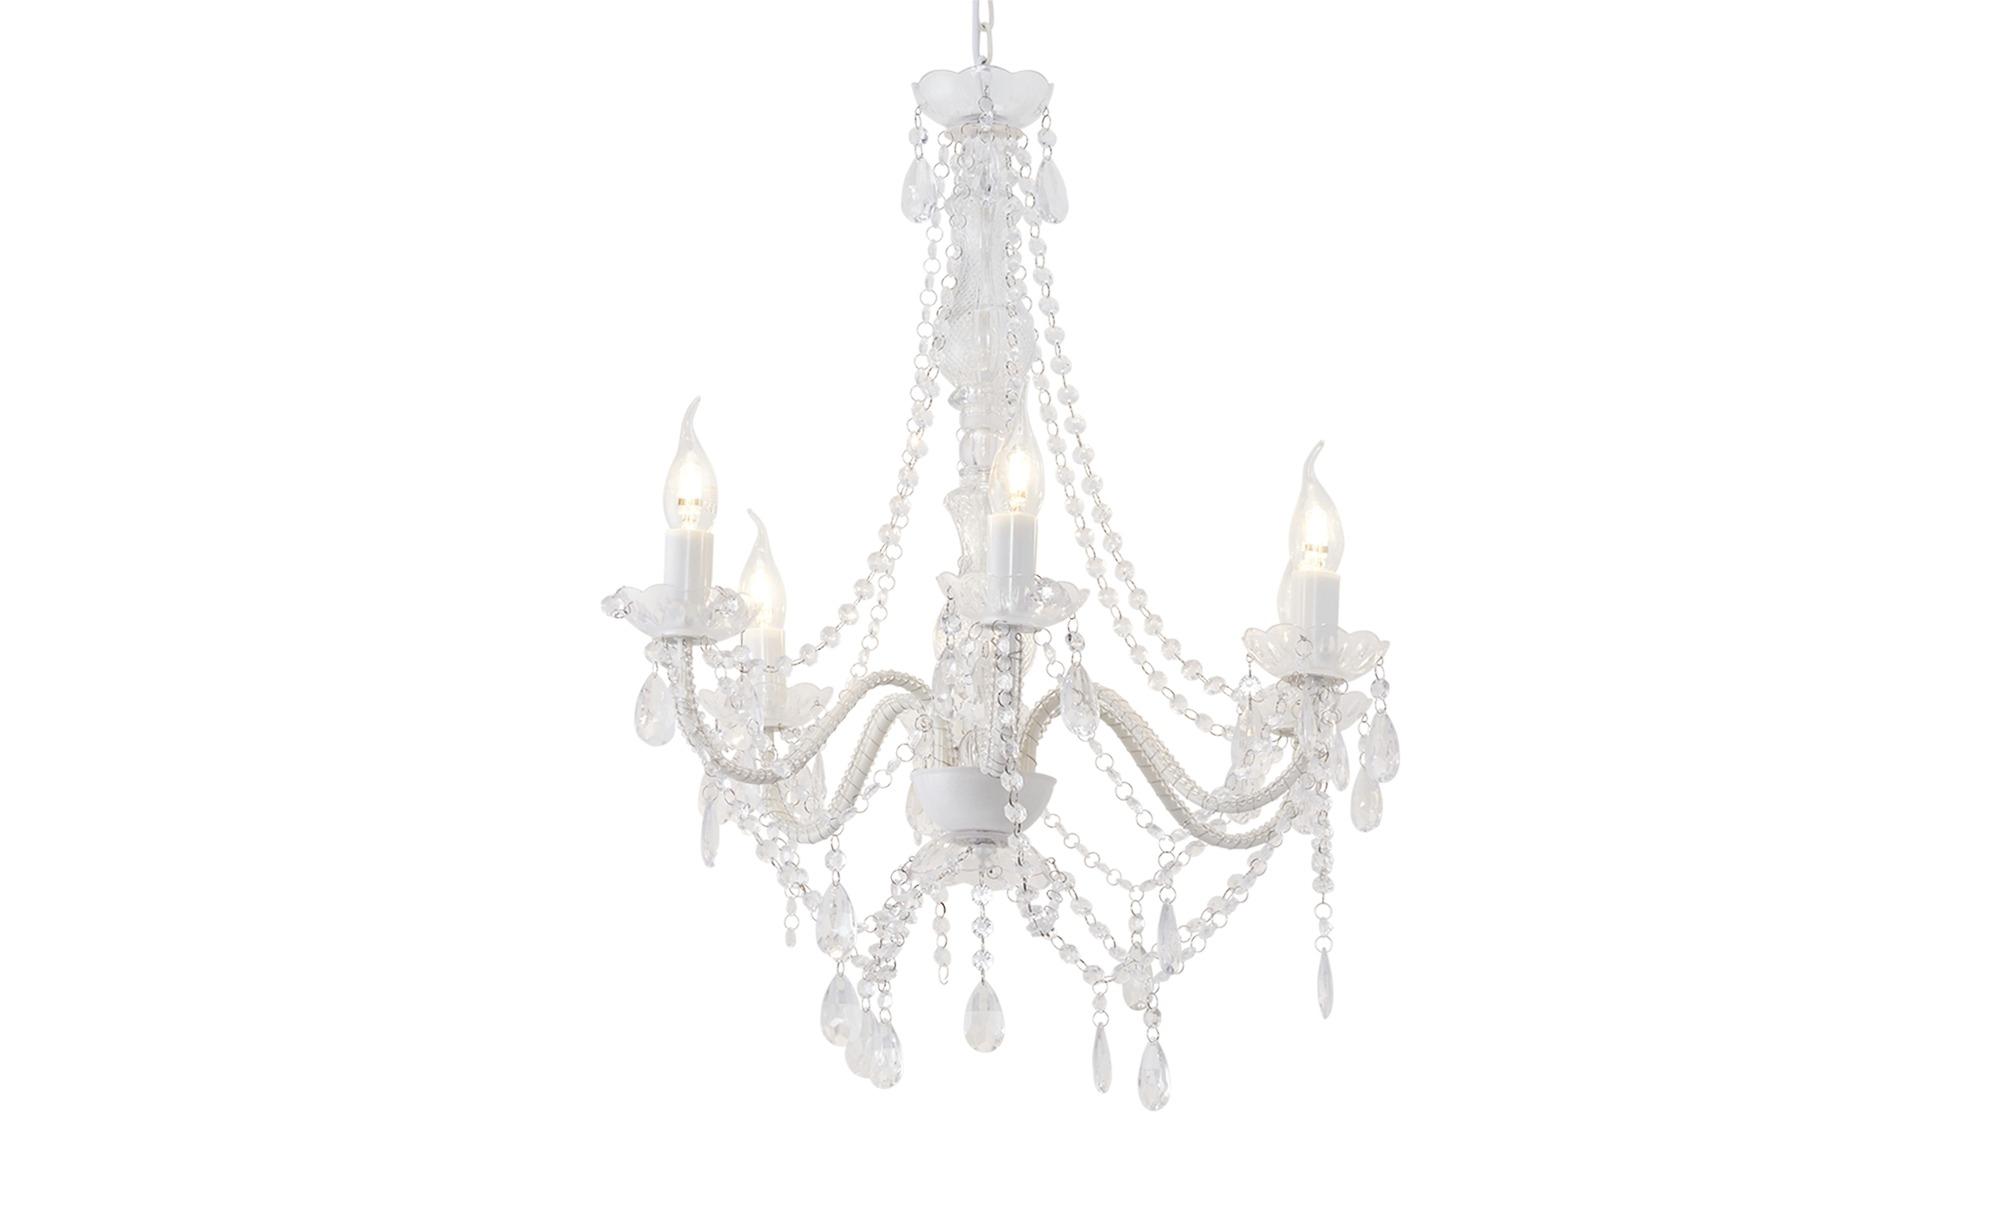 Kare Kronleuchter, 6-flammig, transparent ¦ transparent/klar ¦ Maße (cm): H: 70 Ø: [55.0] Lampen & Leuchten > Innenleuchten > Kronleuchter - Höffner